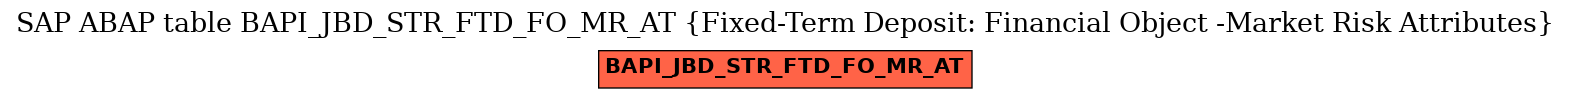 E-R Diagram for table BAPI_JBD_STR_FTD_FO_MR_AT (Fixed-Term Deposit: Financial Object -Market Risk Attributes)